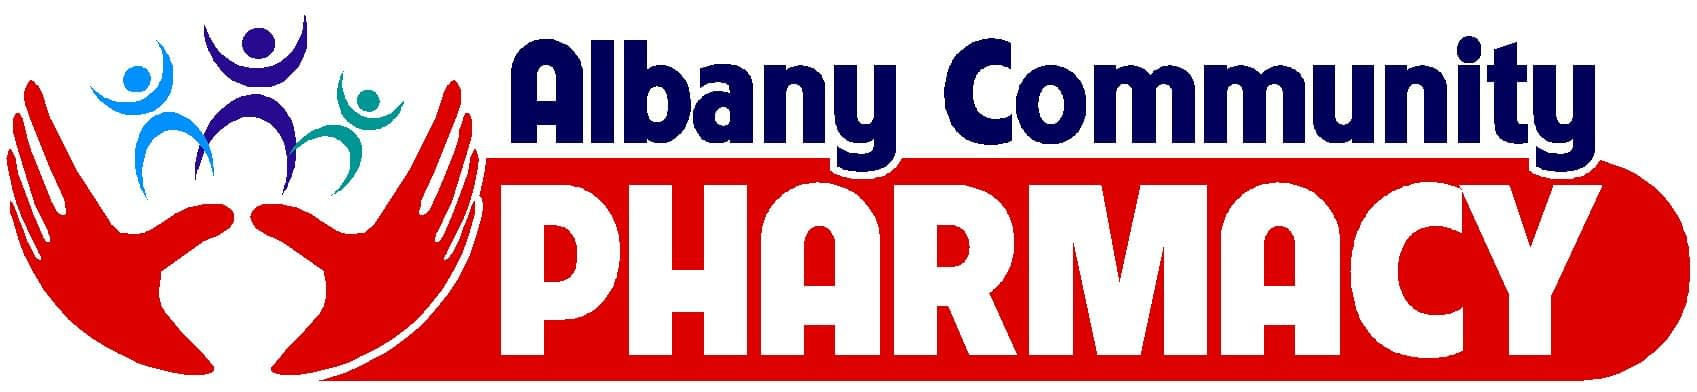 Albany Community Pharmacy